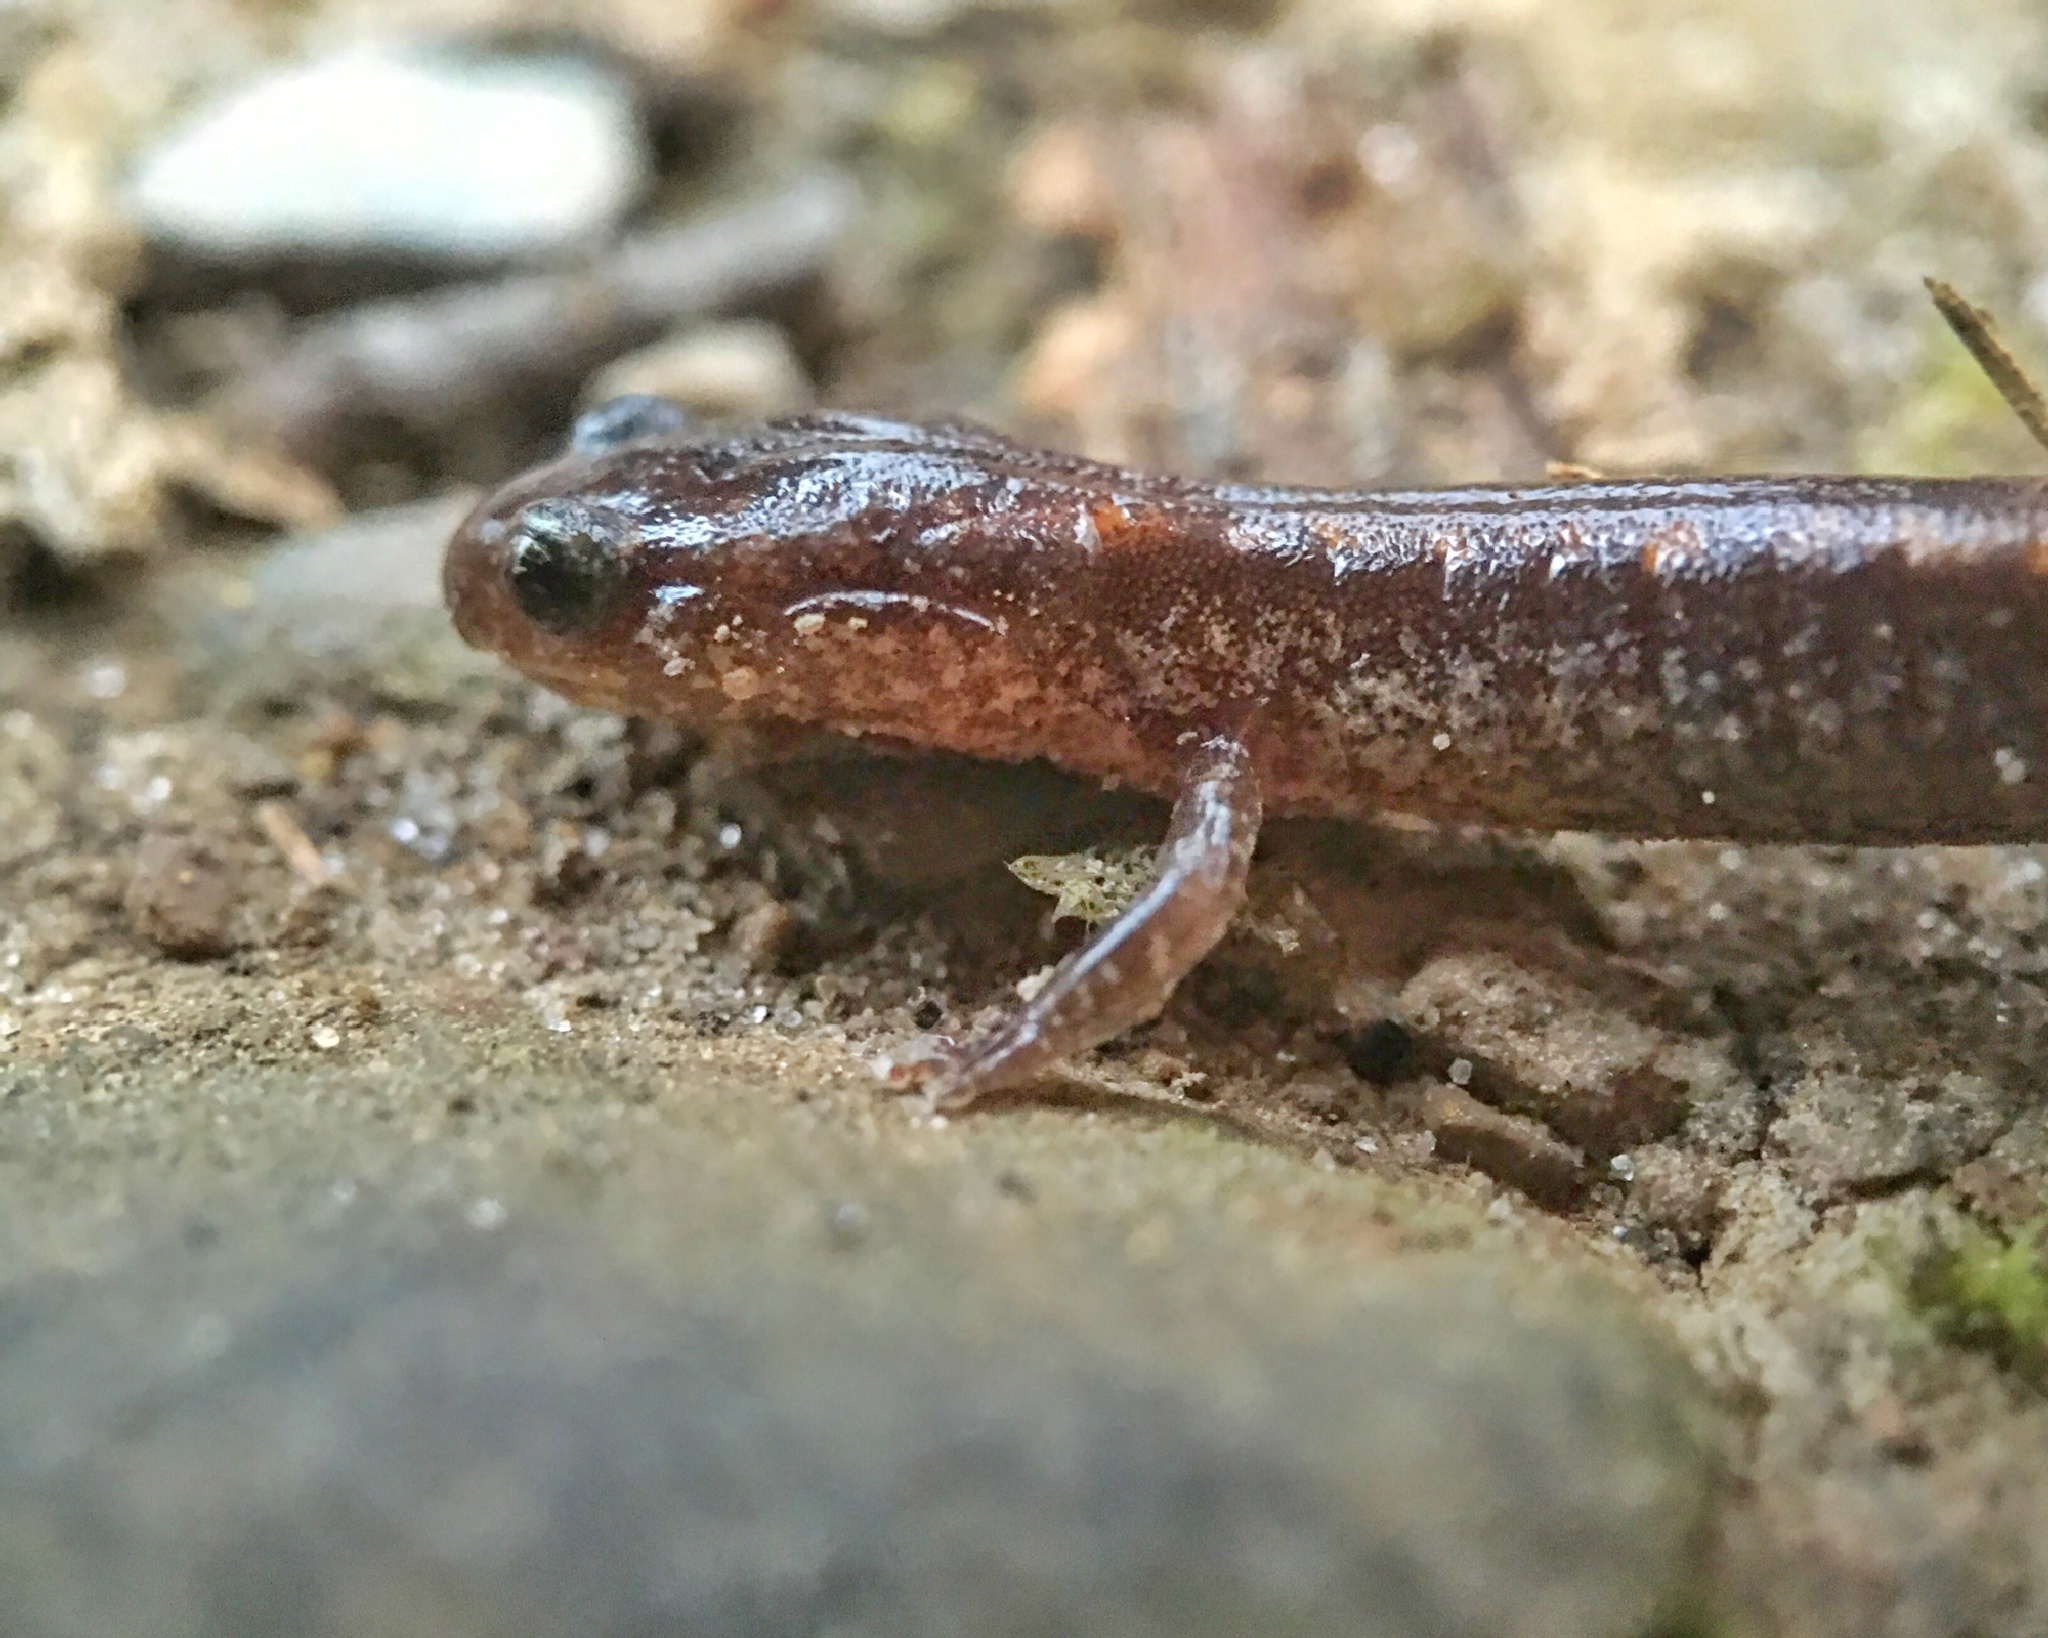 The Salamander by mattdevore